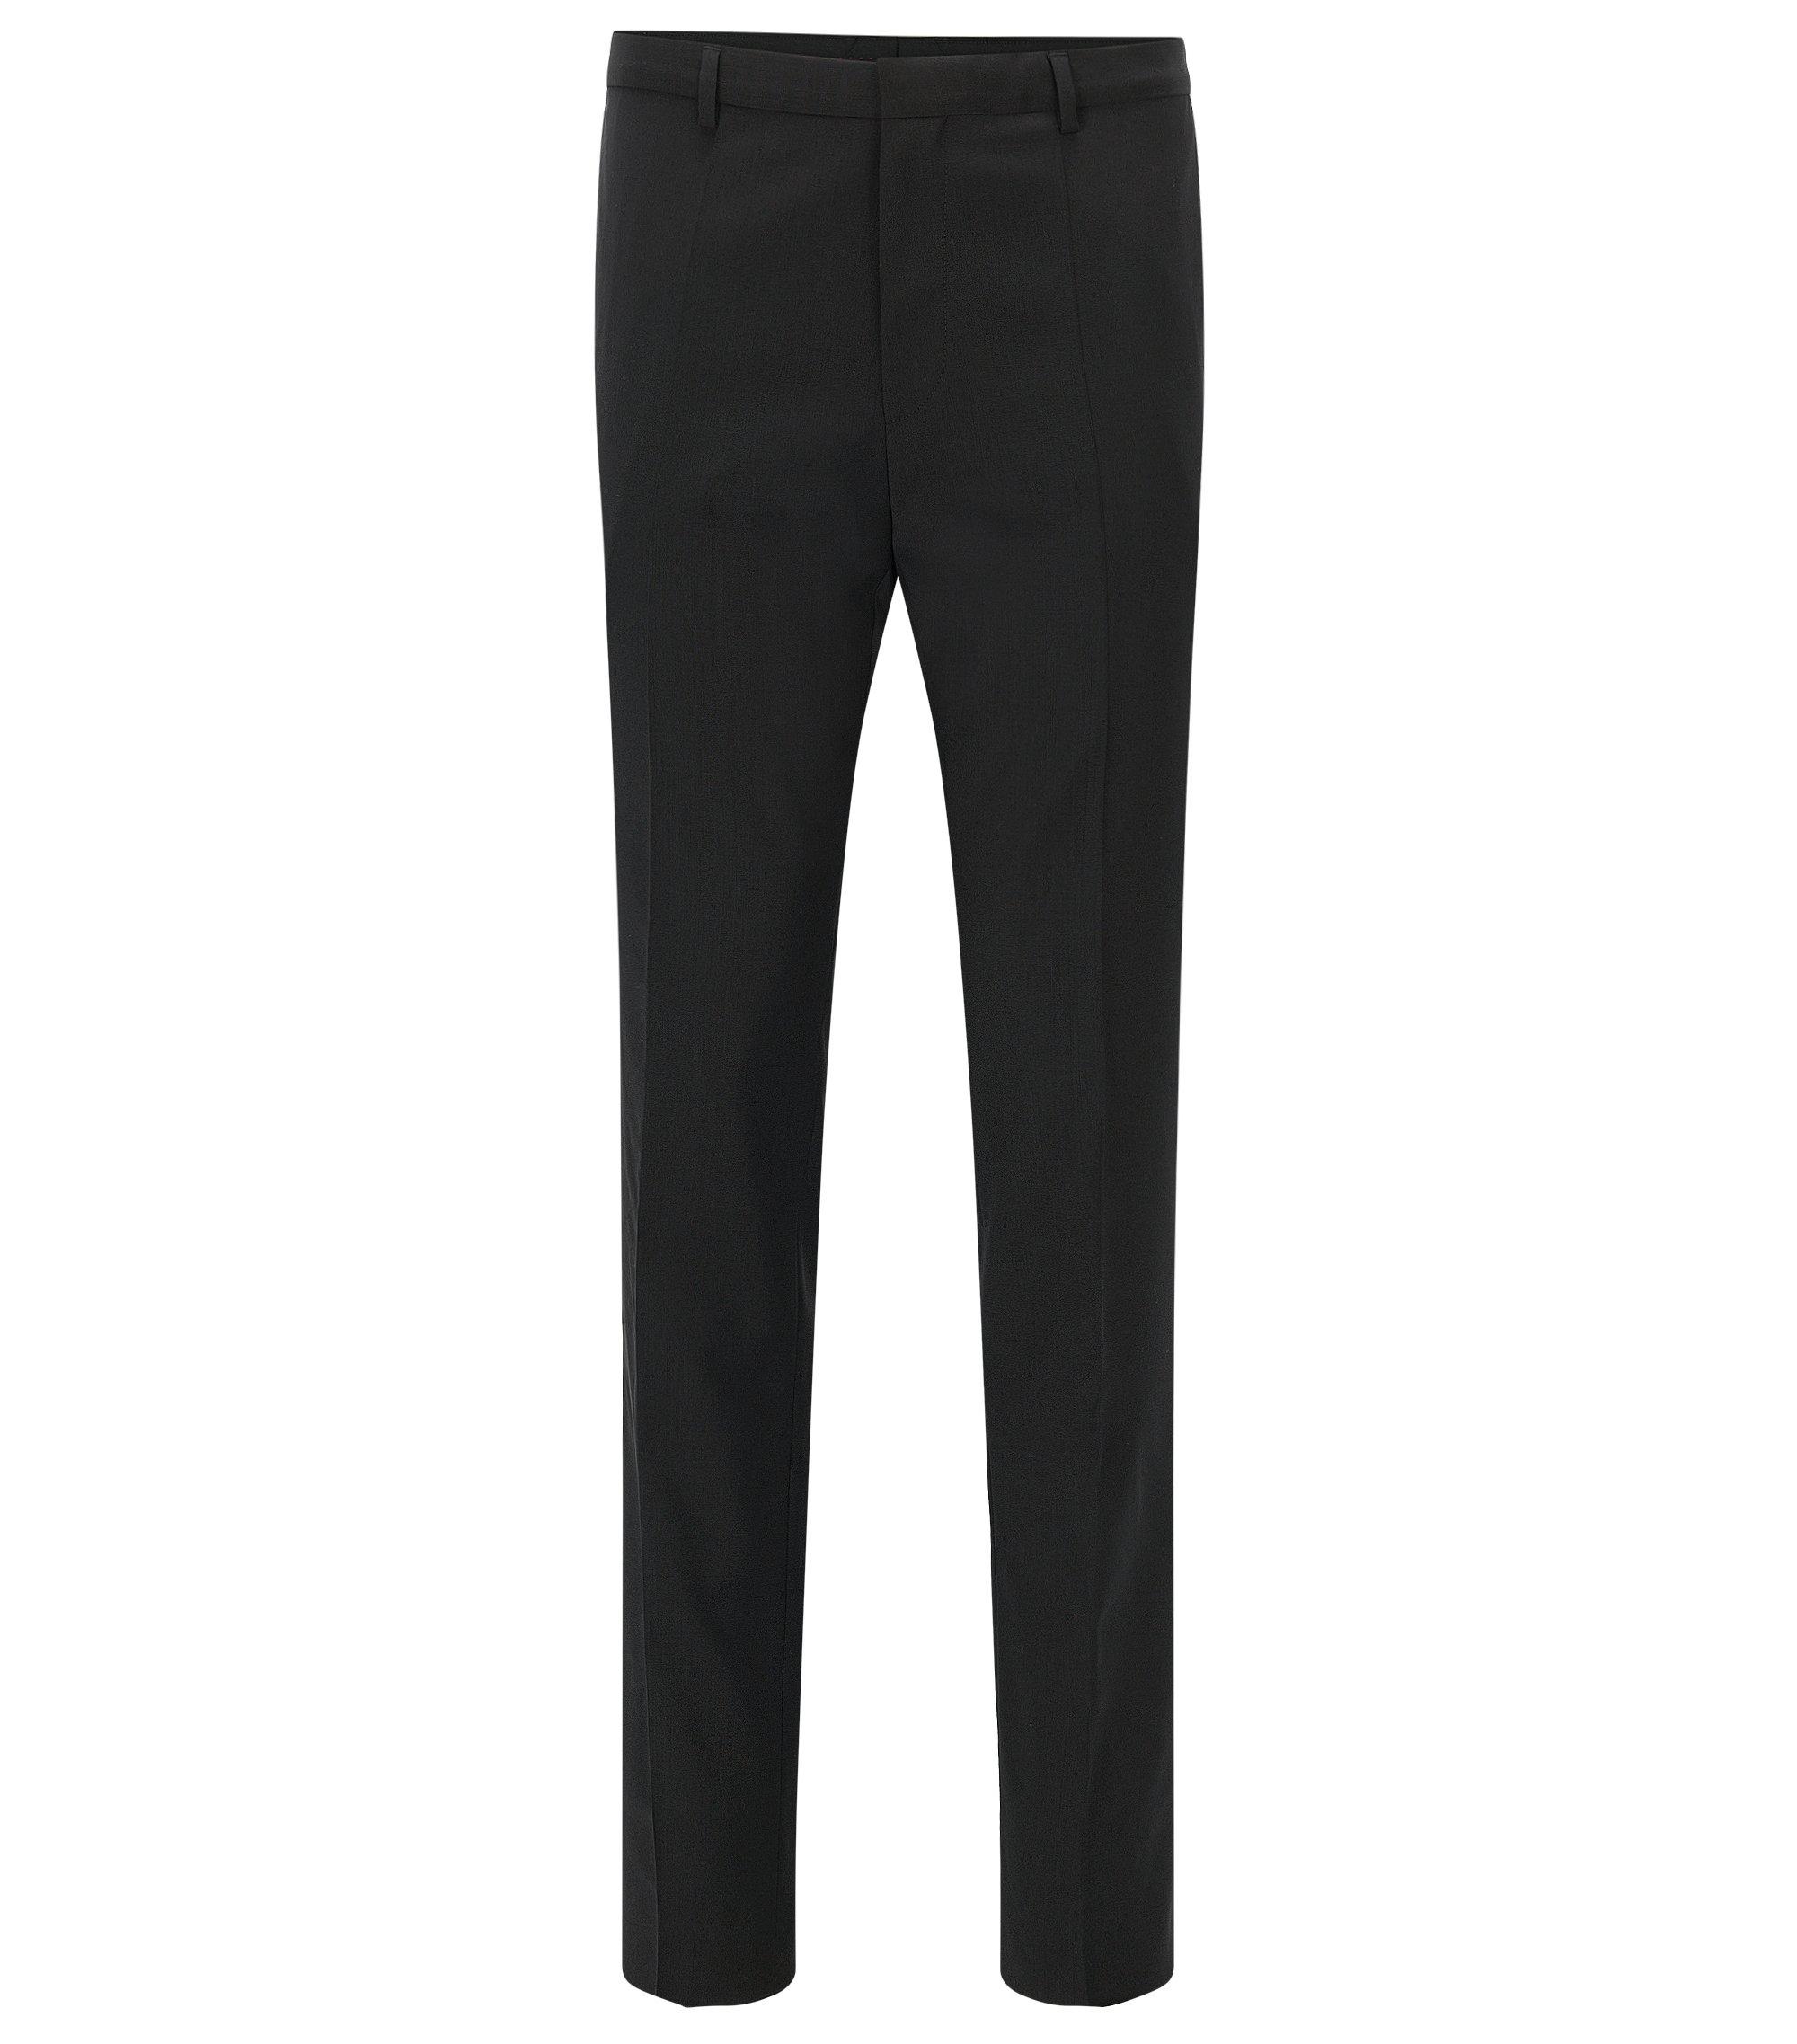 Pantalón extra slim fit en lana virgen de HUGO Hombre, Negro